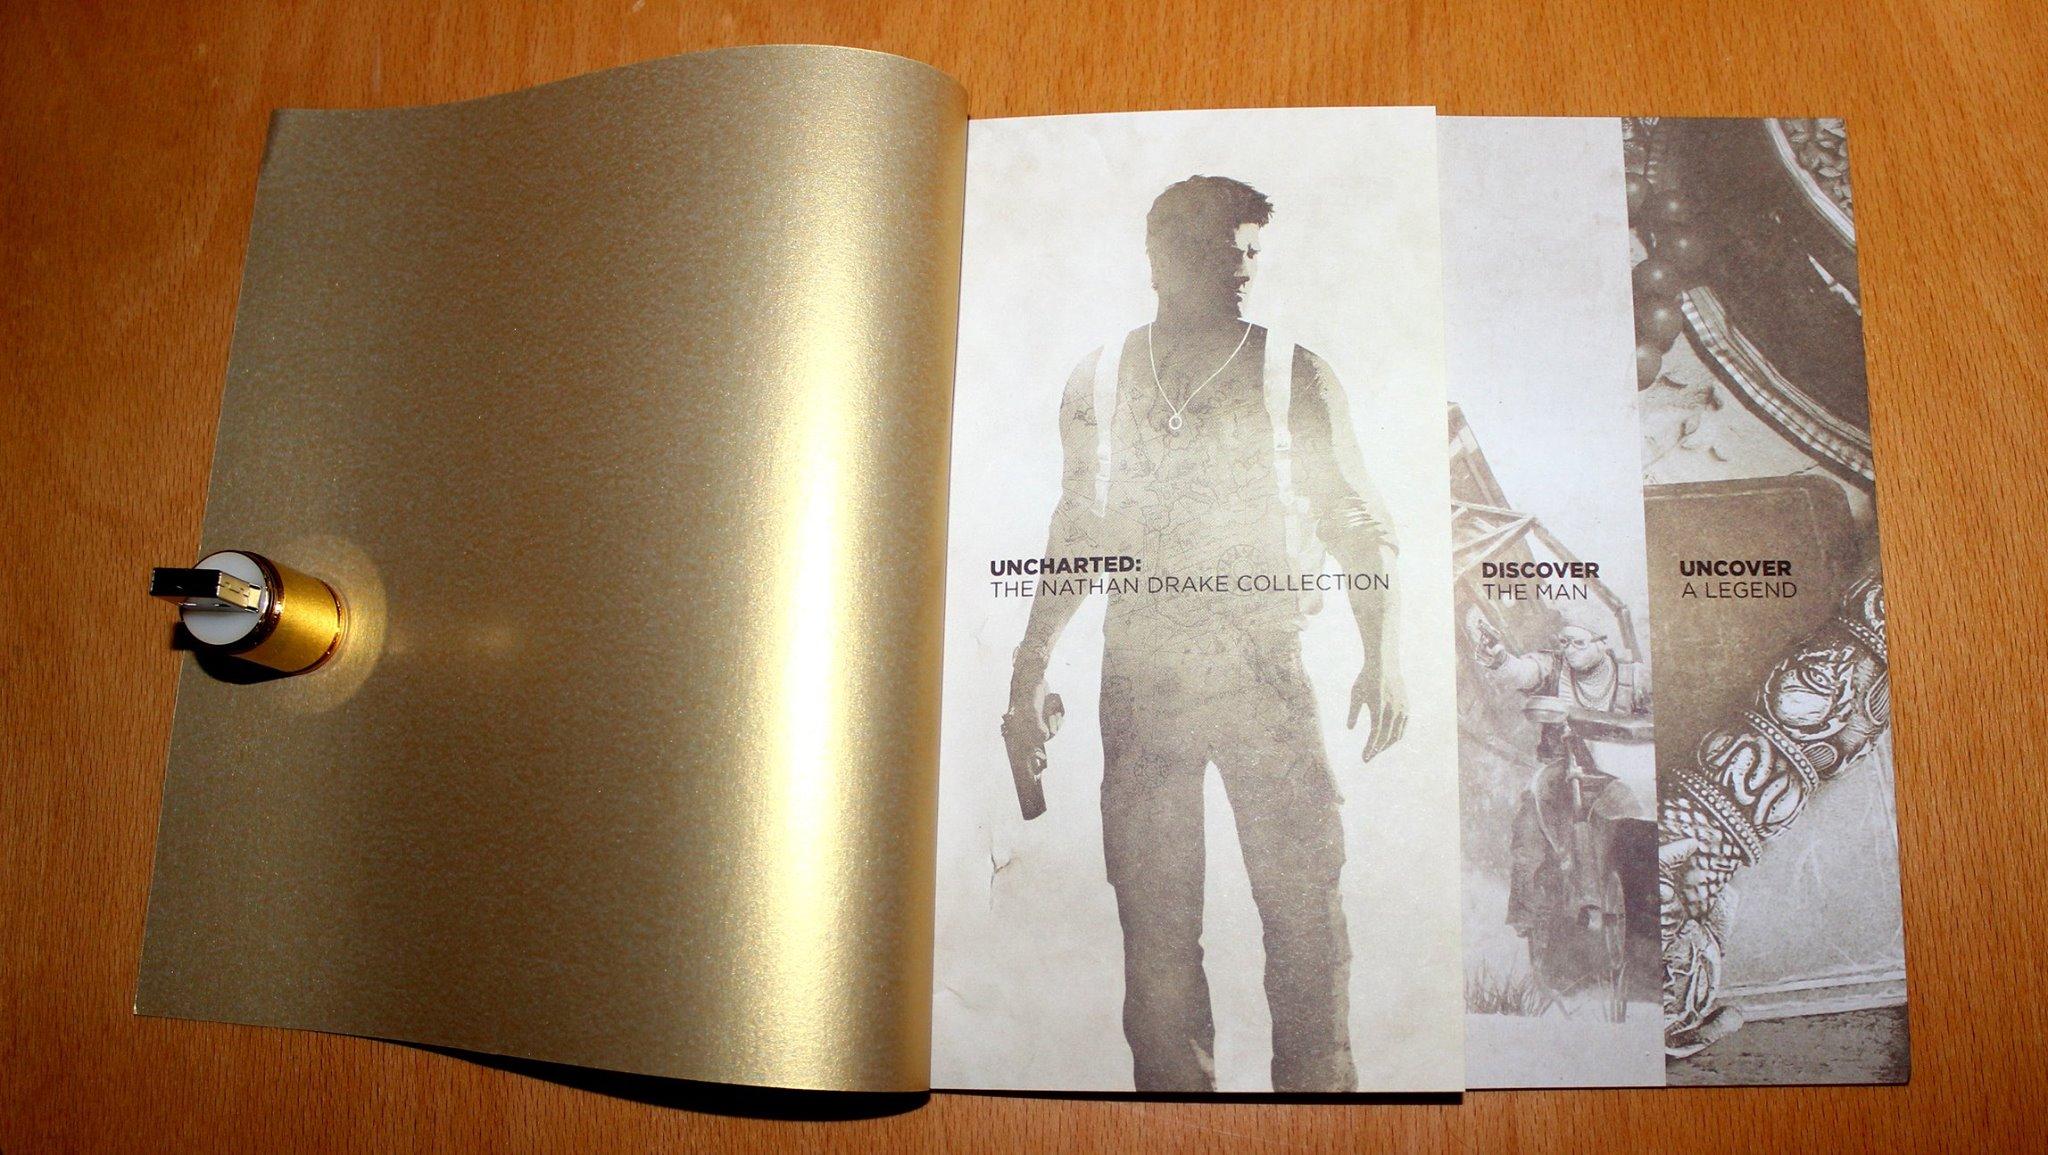 Stahujte demo Uncharted: The Nathan Drake Collection 114484